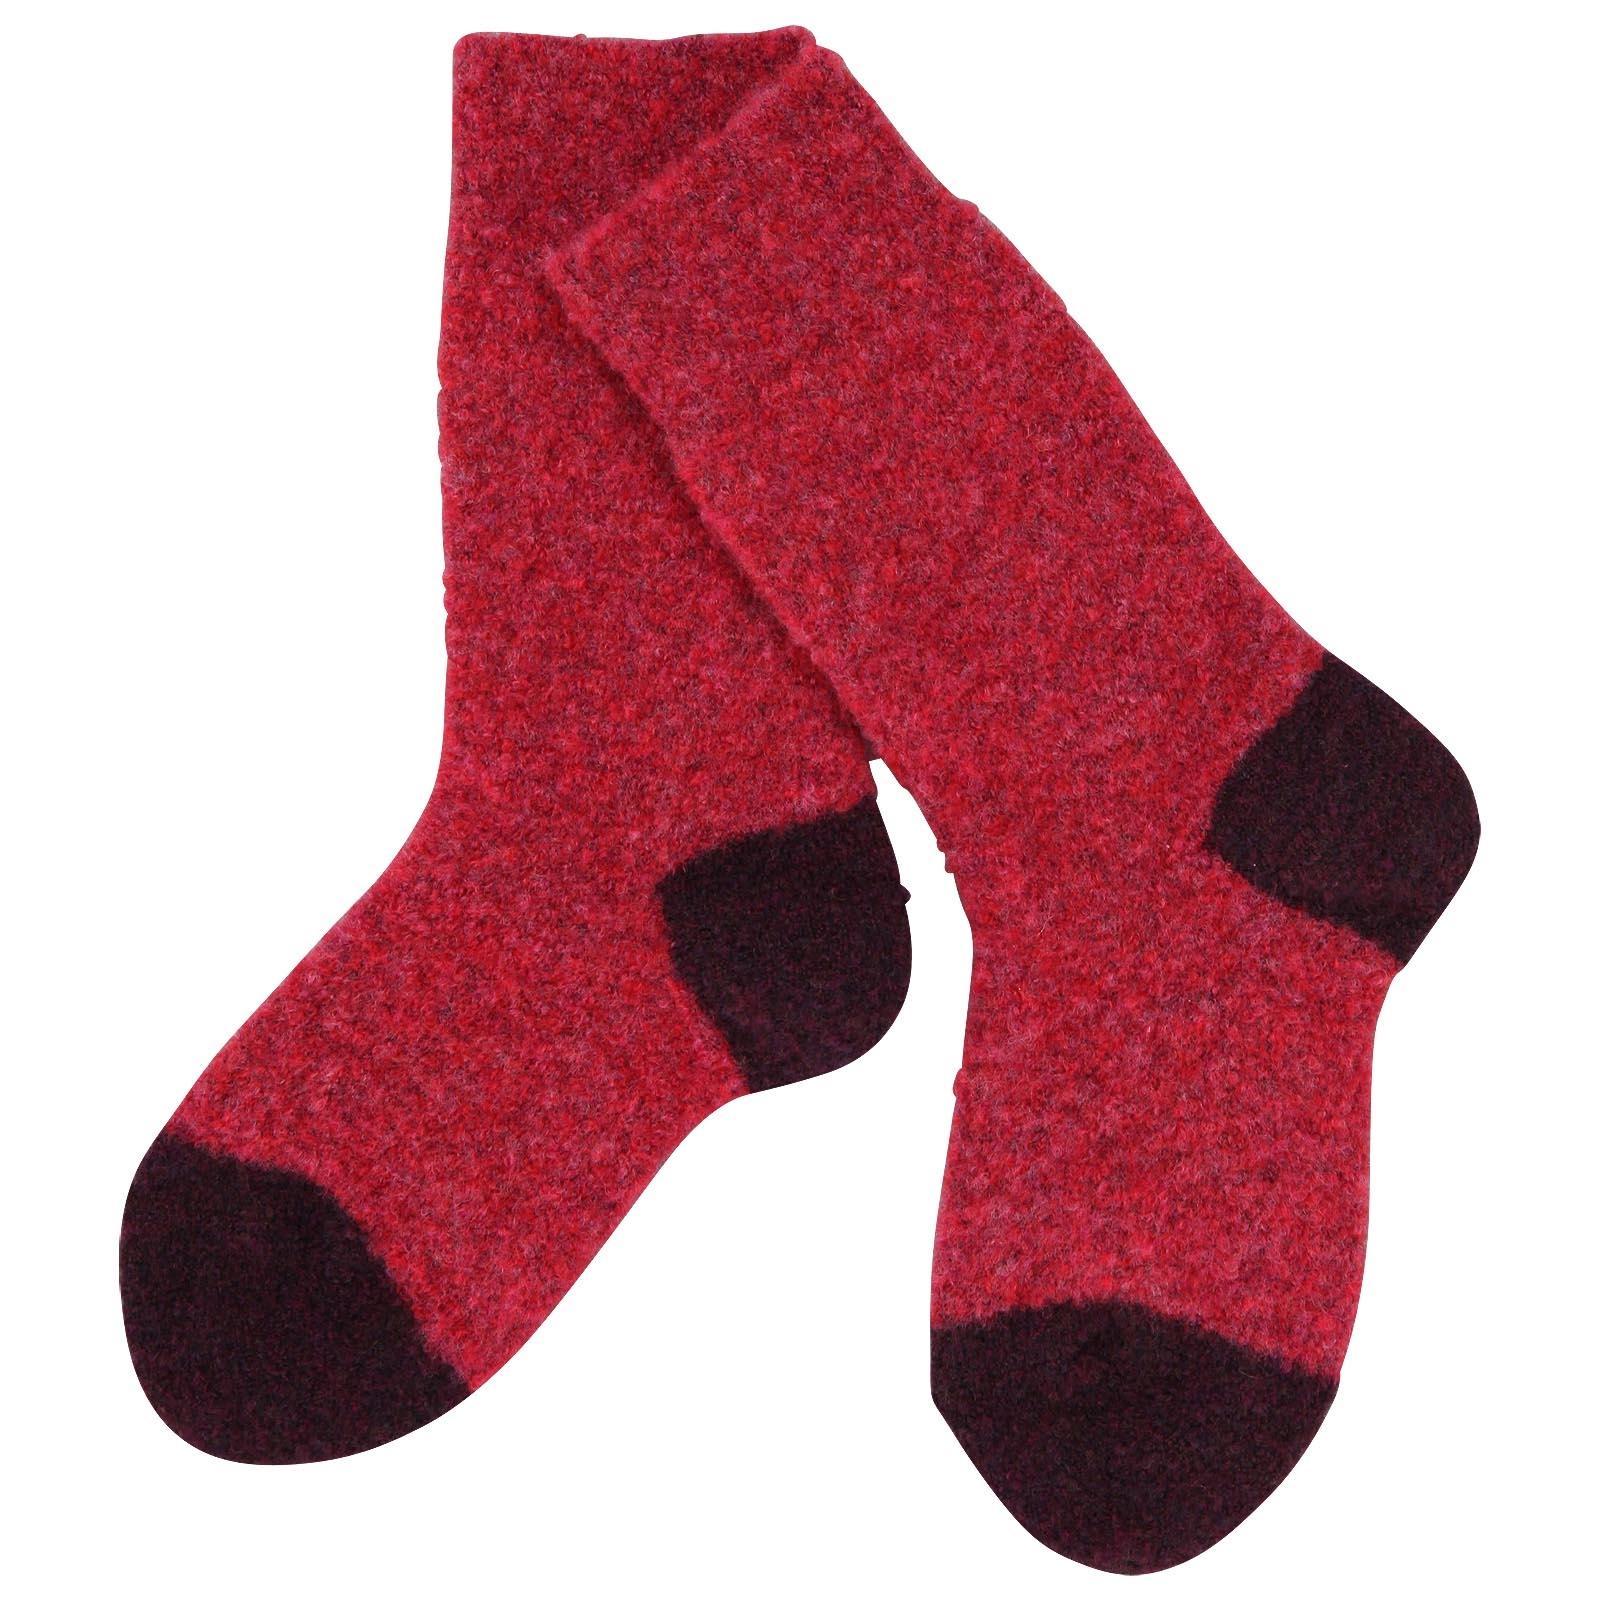 Brescia sock drive keeps feet warm nationwide